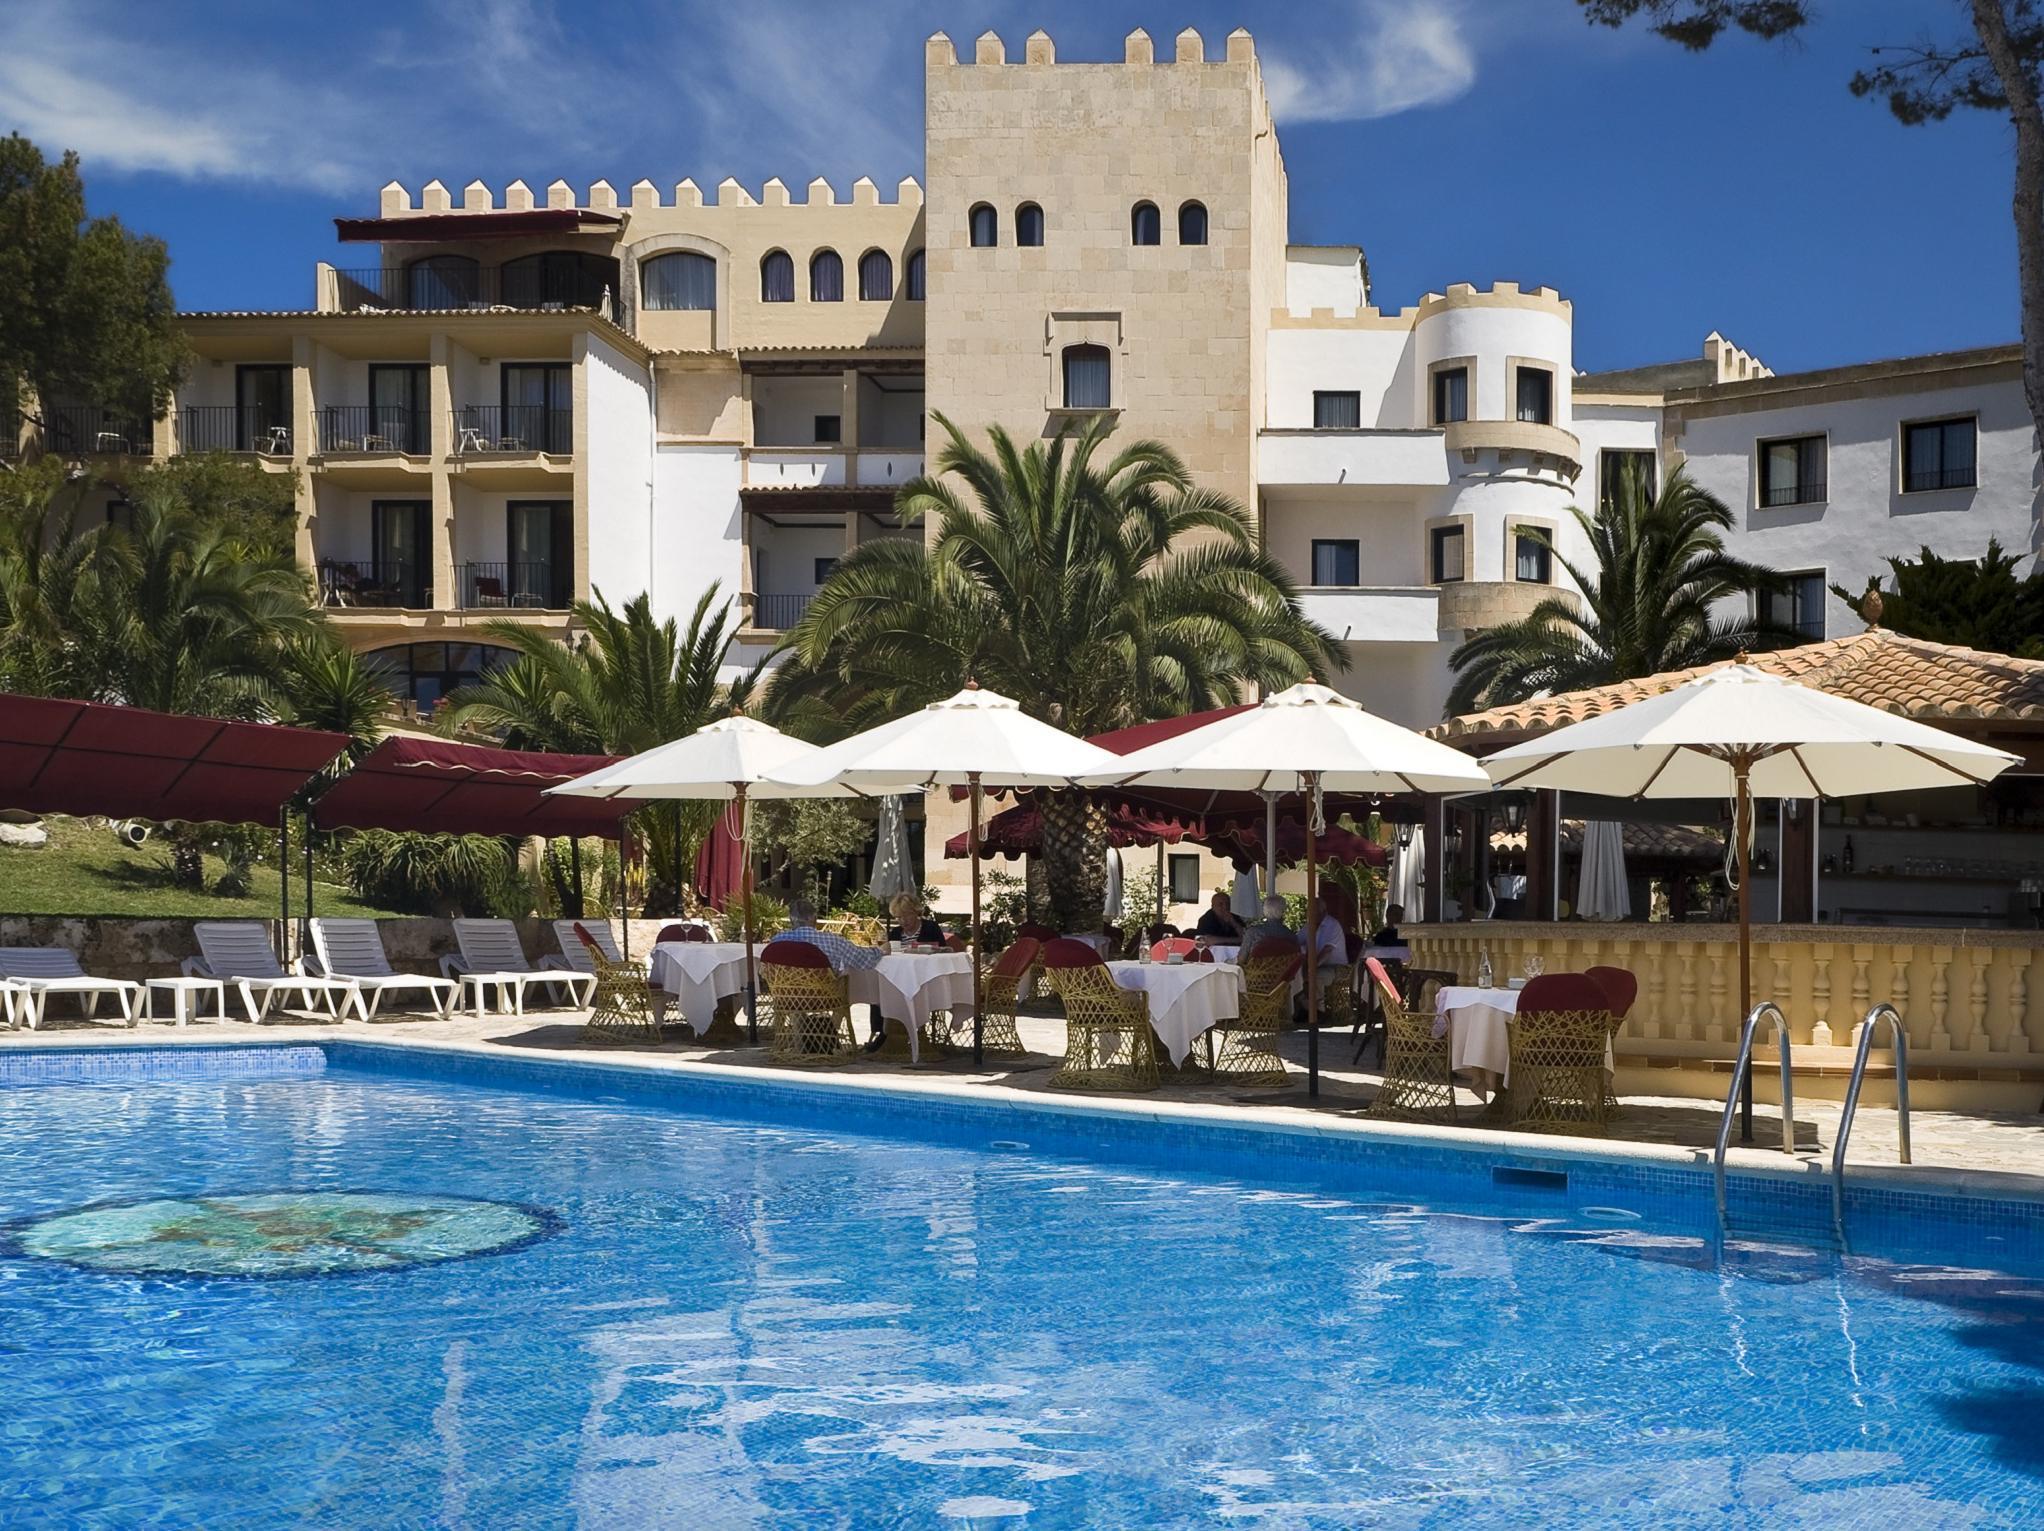 Hesperia Mallorca Villamil - Adults Only